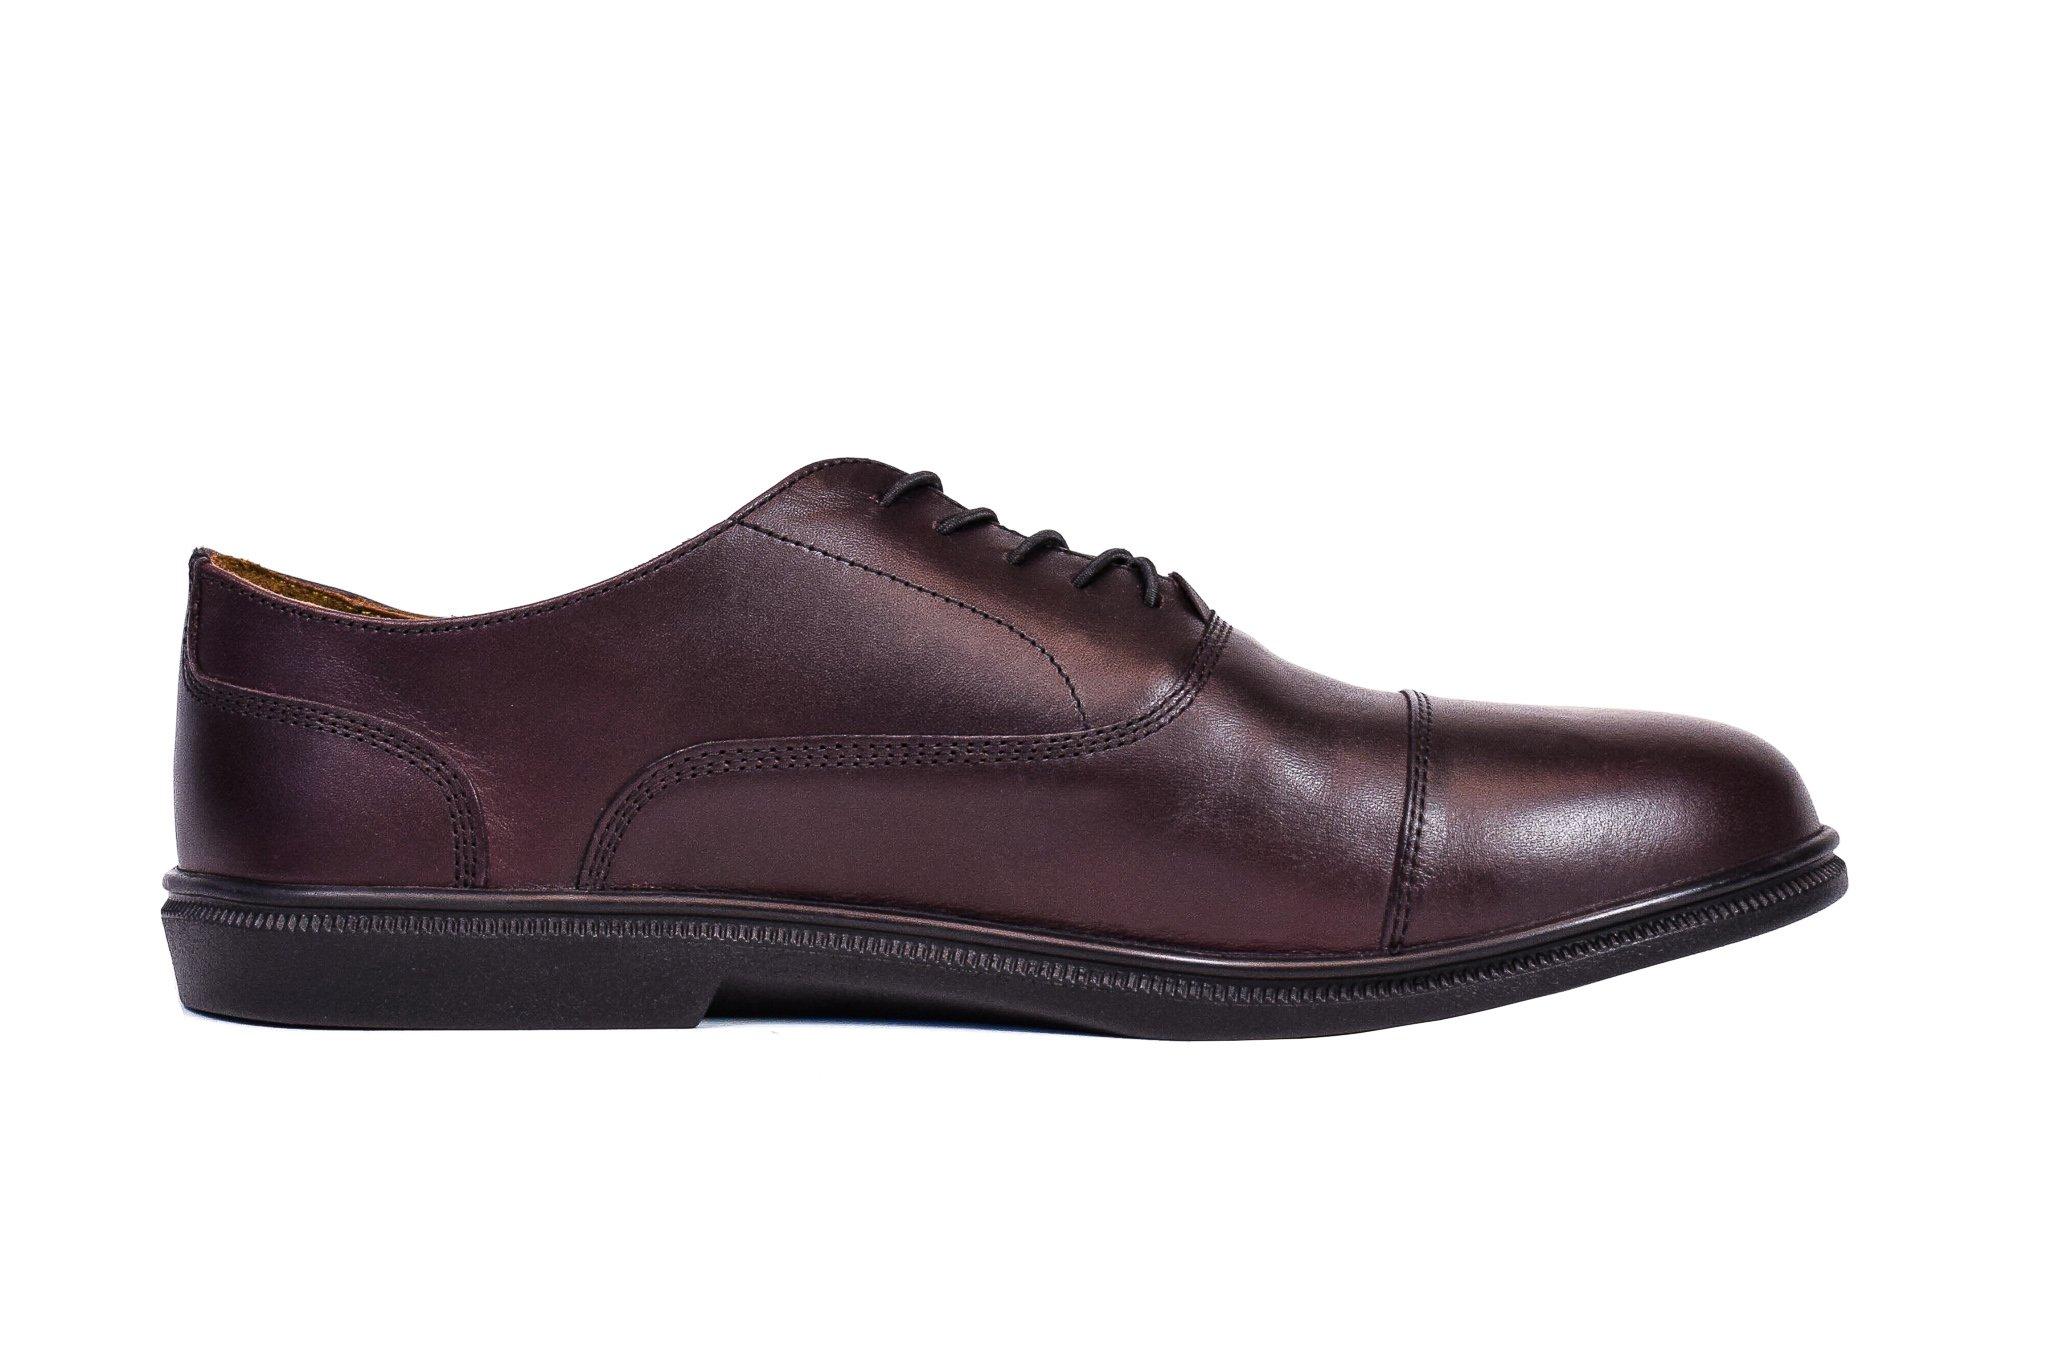 Carets minimalist men's dress shoe